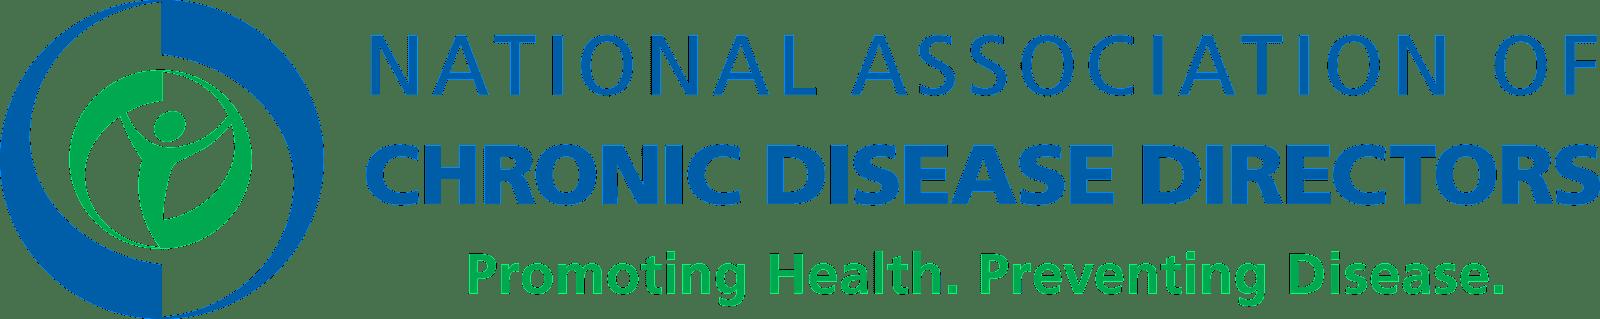 Chronic Disease Prevention - National Association of Chronic Disease  Directors (NACDD)